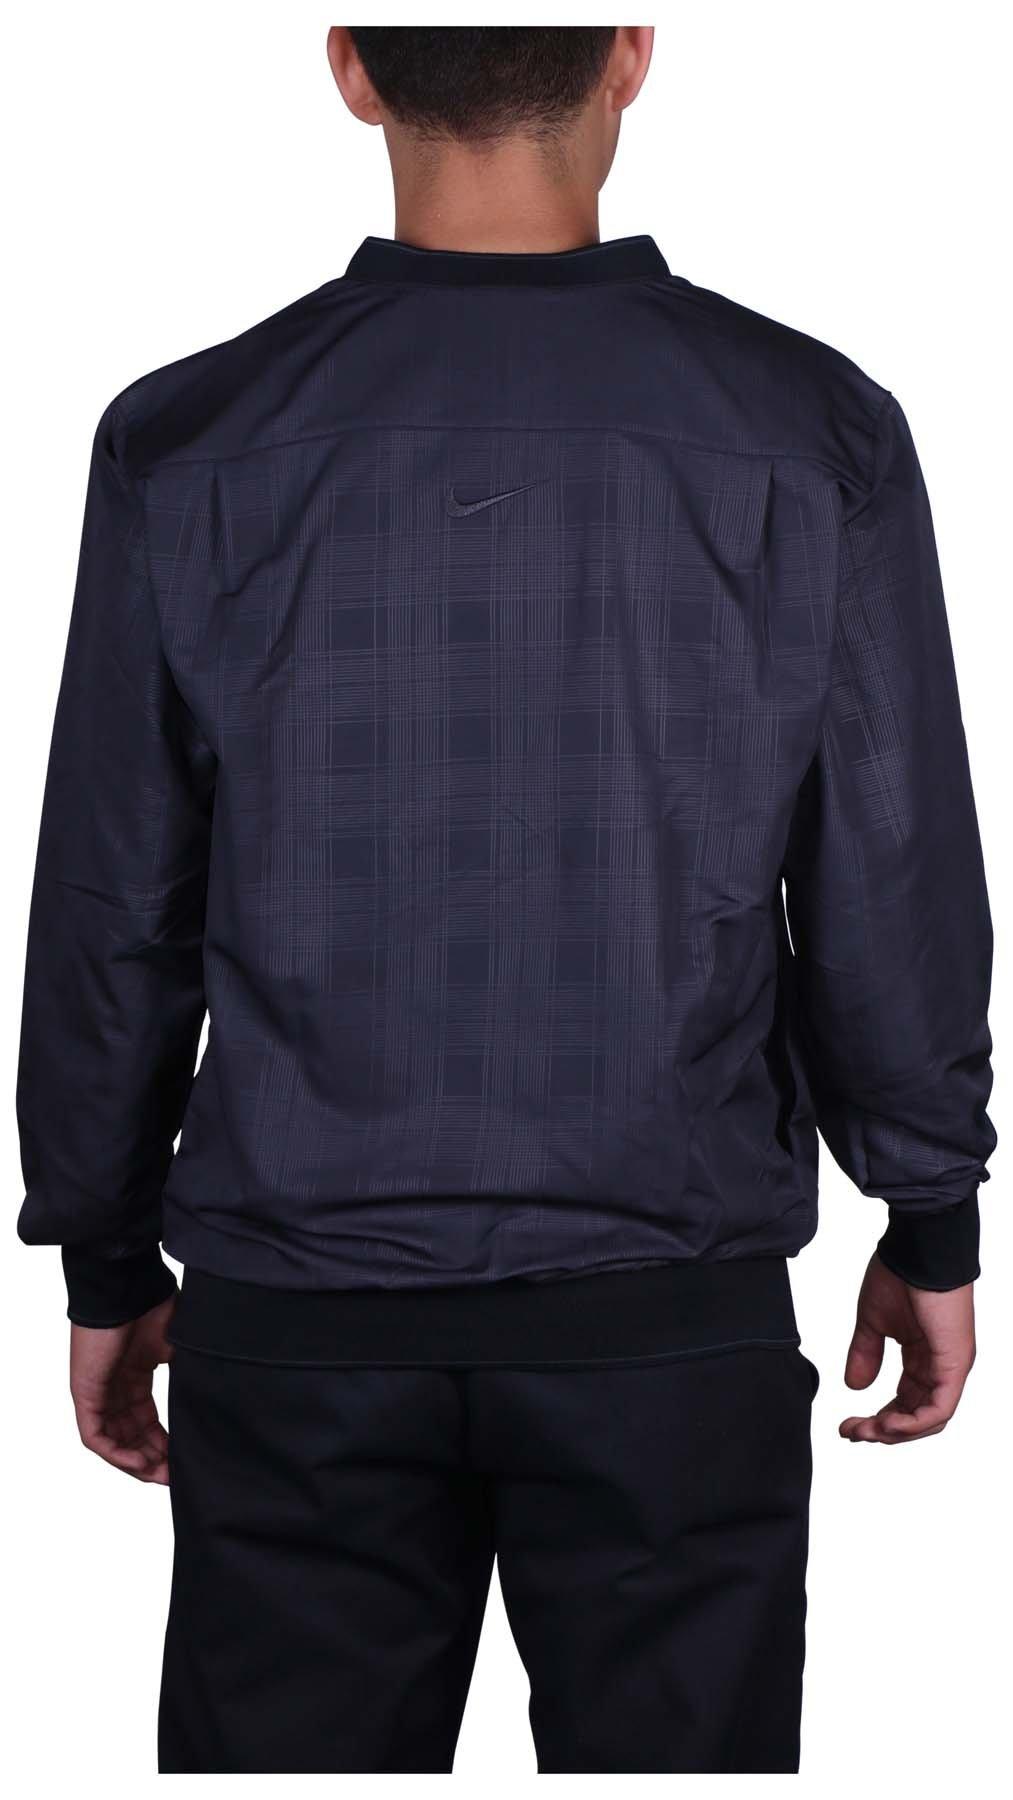 Nike Golf Men's Classic Half Zip Wind Jacket (Black, Small) by Nike Golf (Image #2)